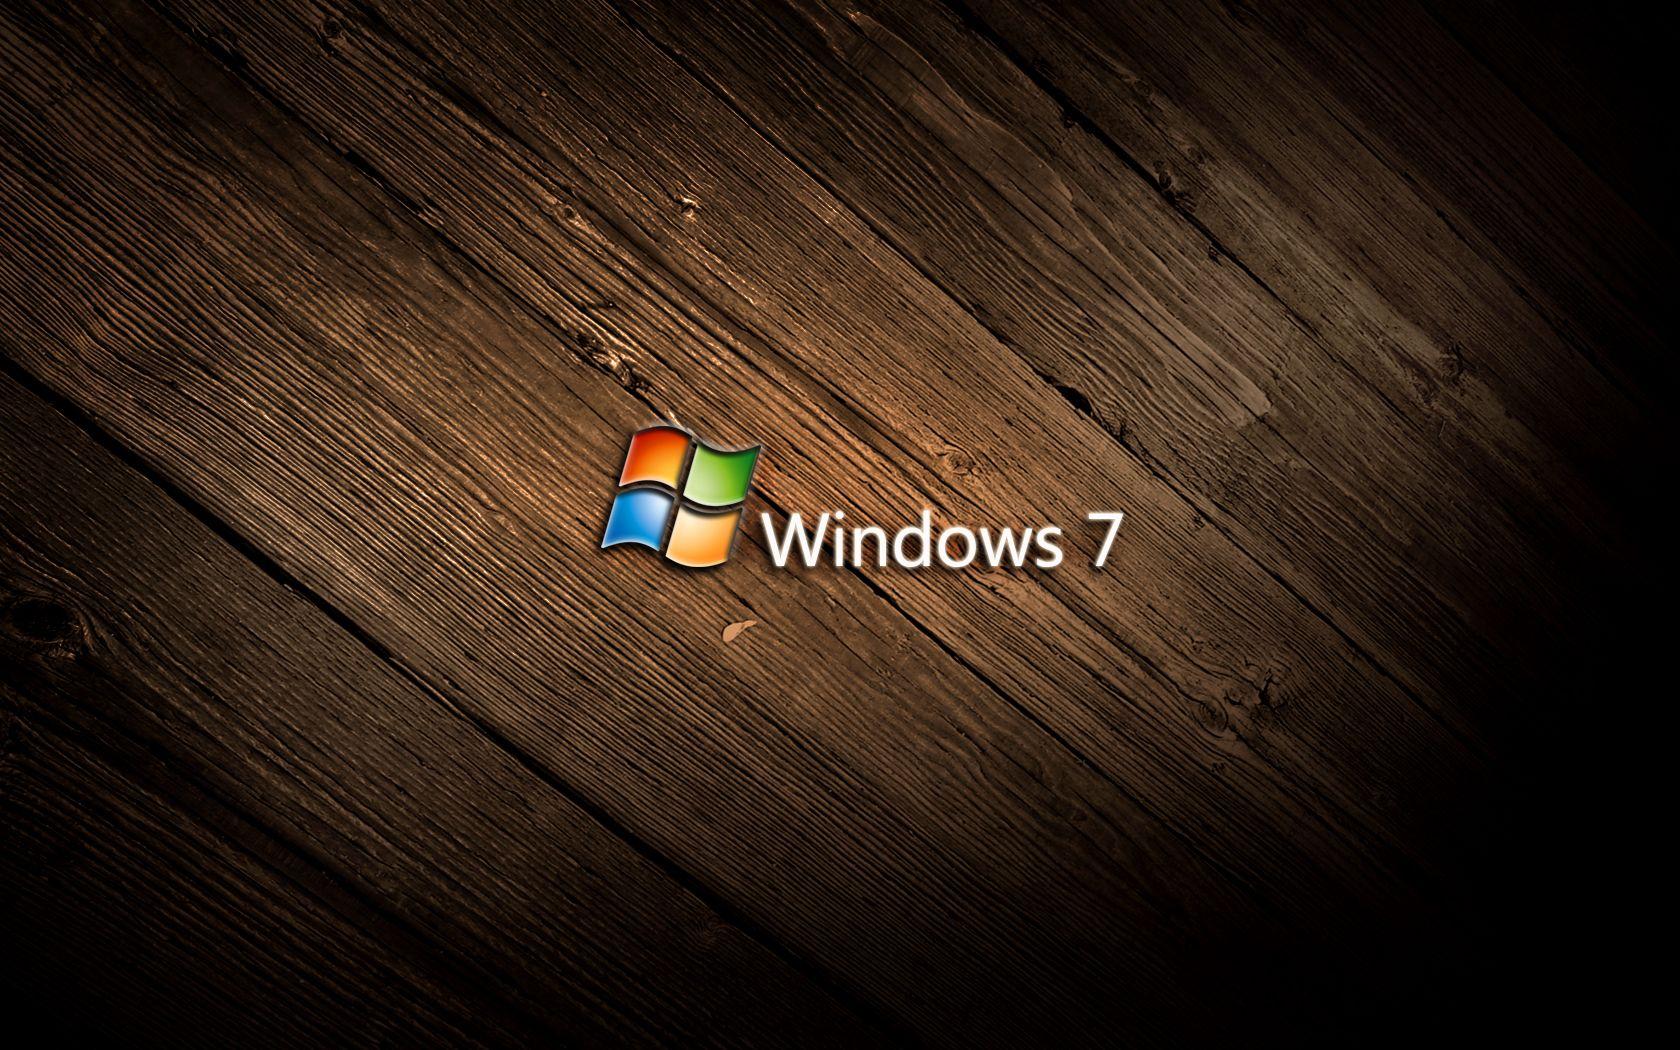 Hd Wallpapers Windows 7 Windows 7 Graphics Windows 7 Hd Windows 7 Hd Wallpaper Top For Des Windows Wallpaper Hd Wallpapers For Laptop Windows Desktop Wallpaper